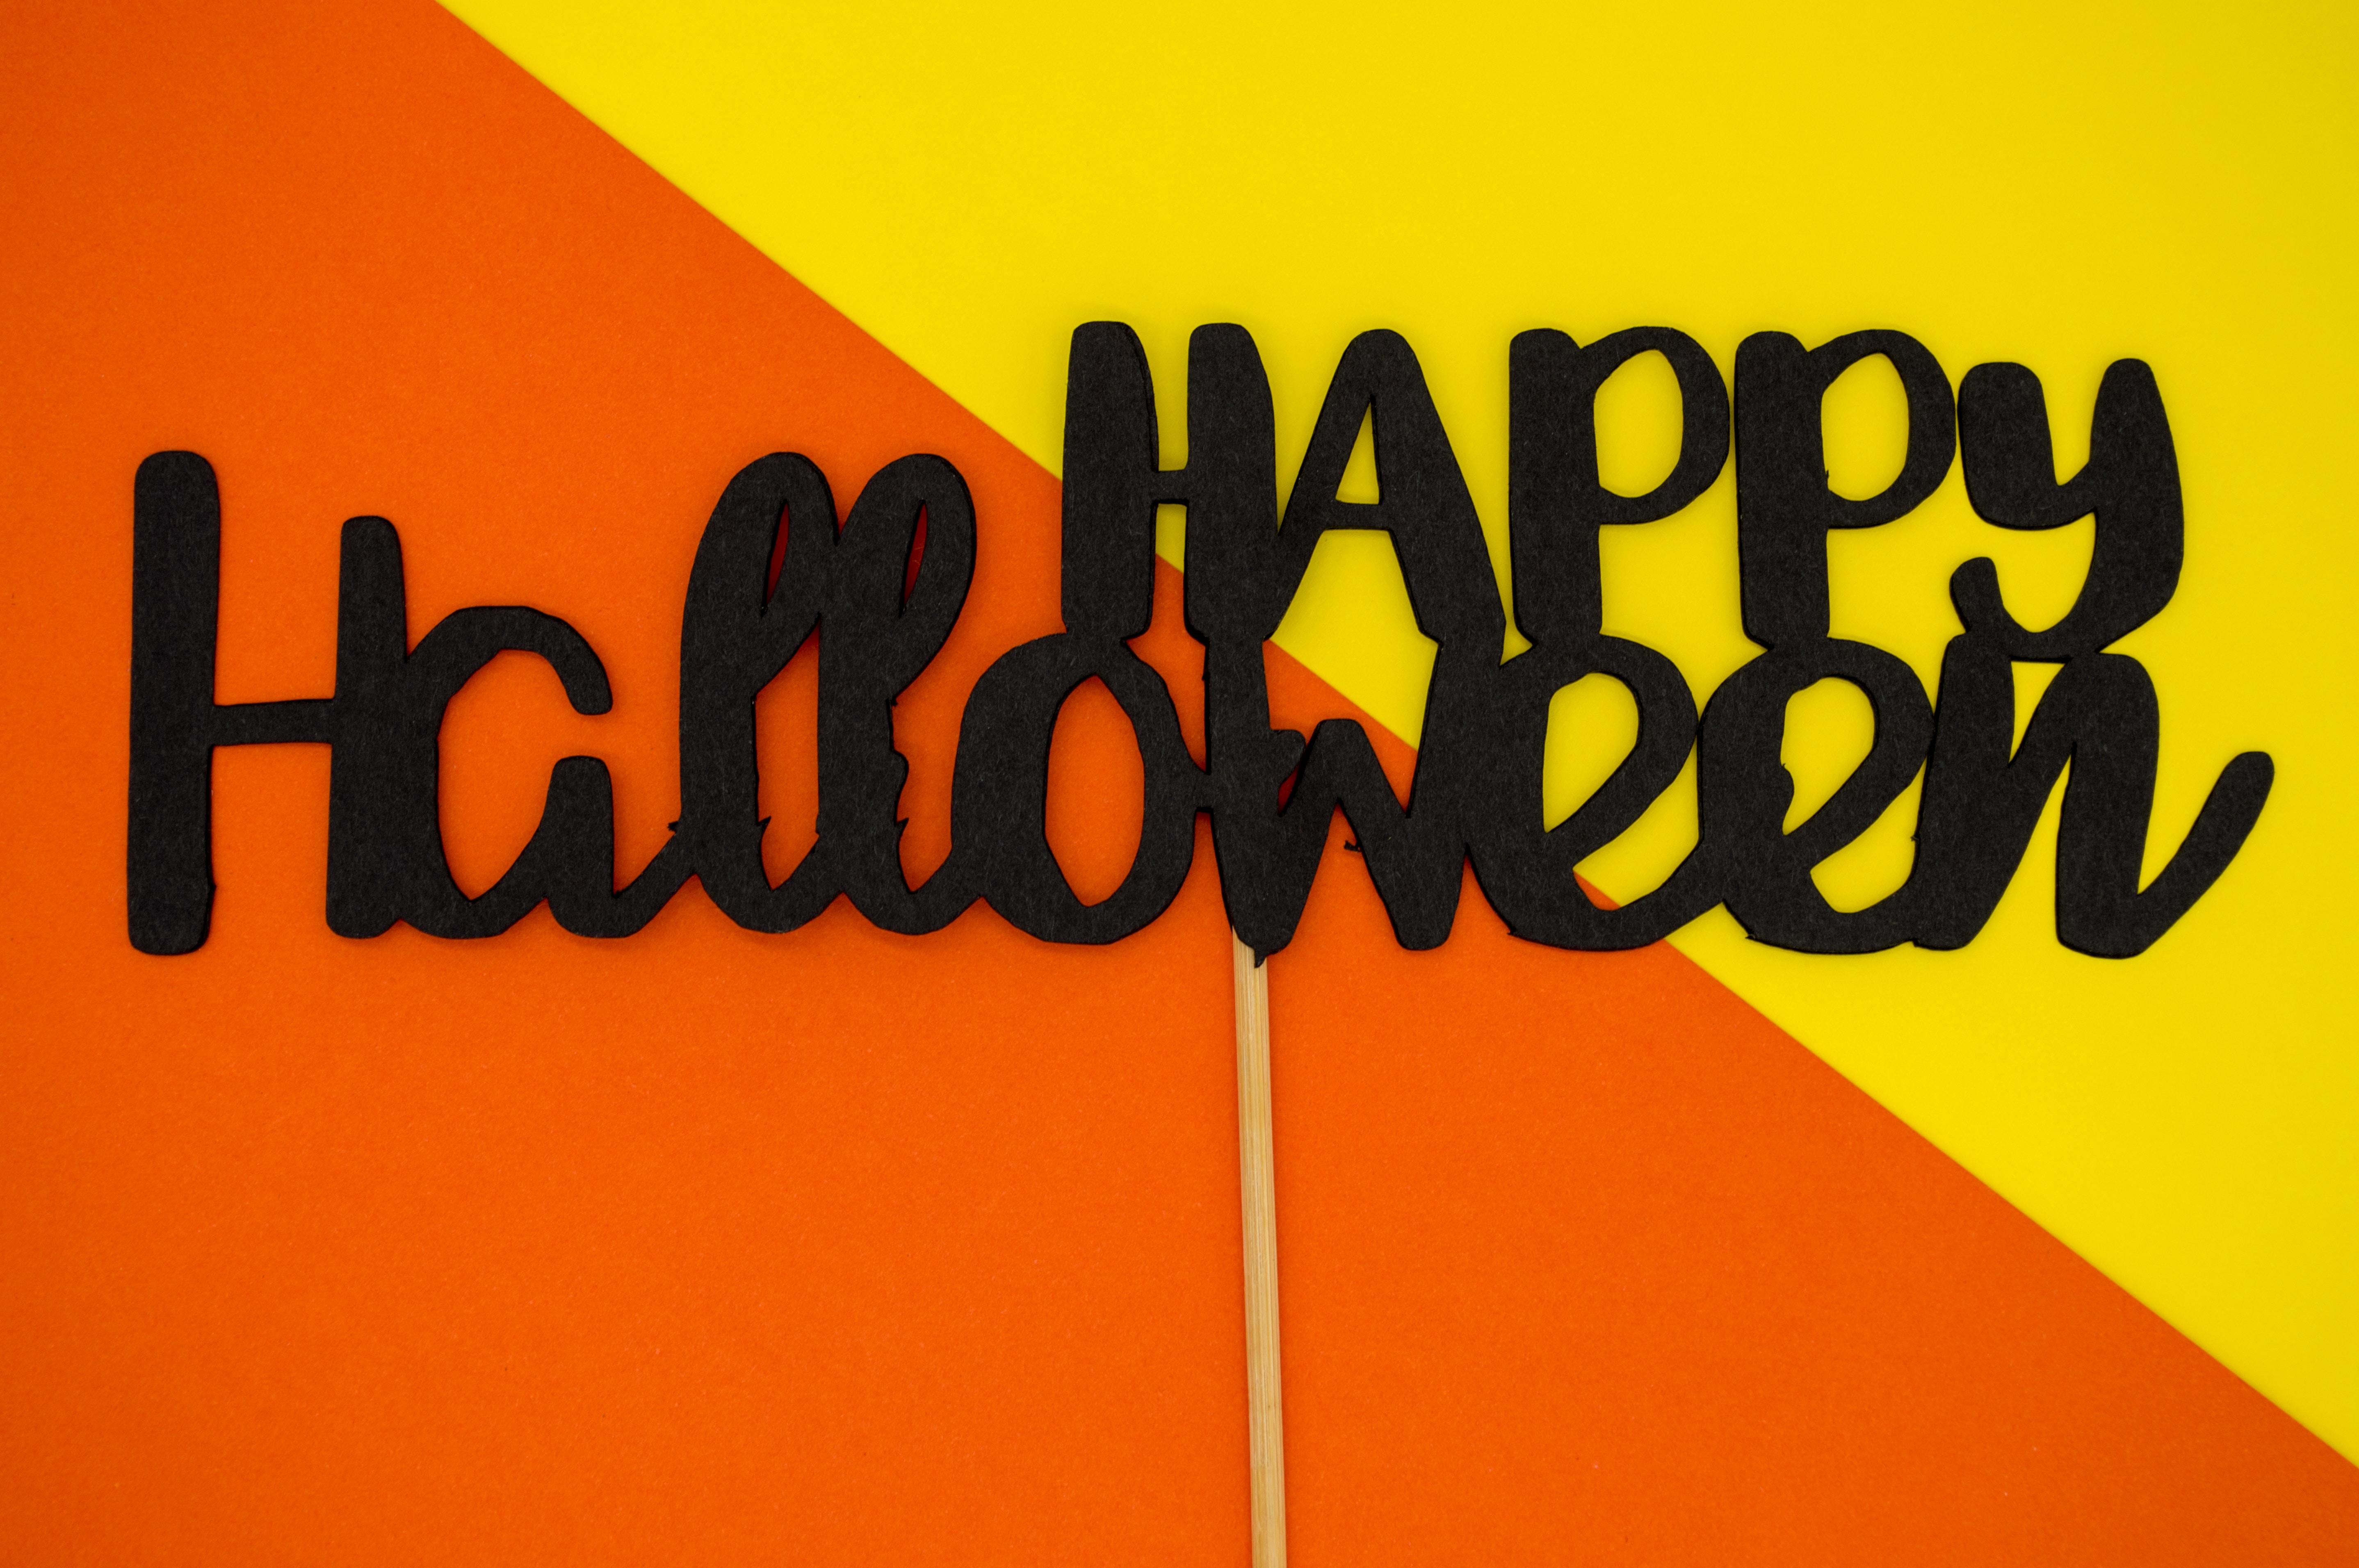 Happy Halloween text